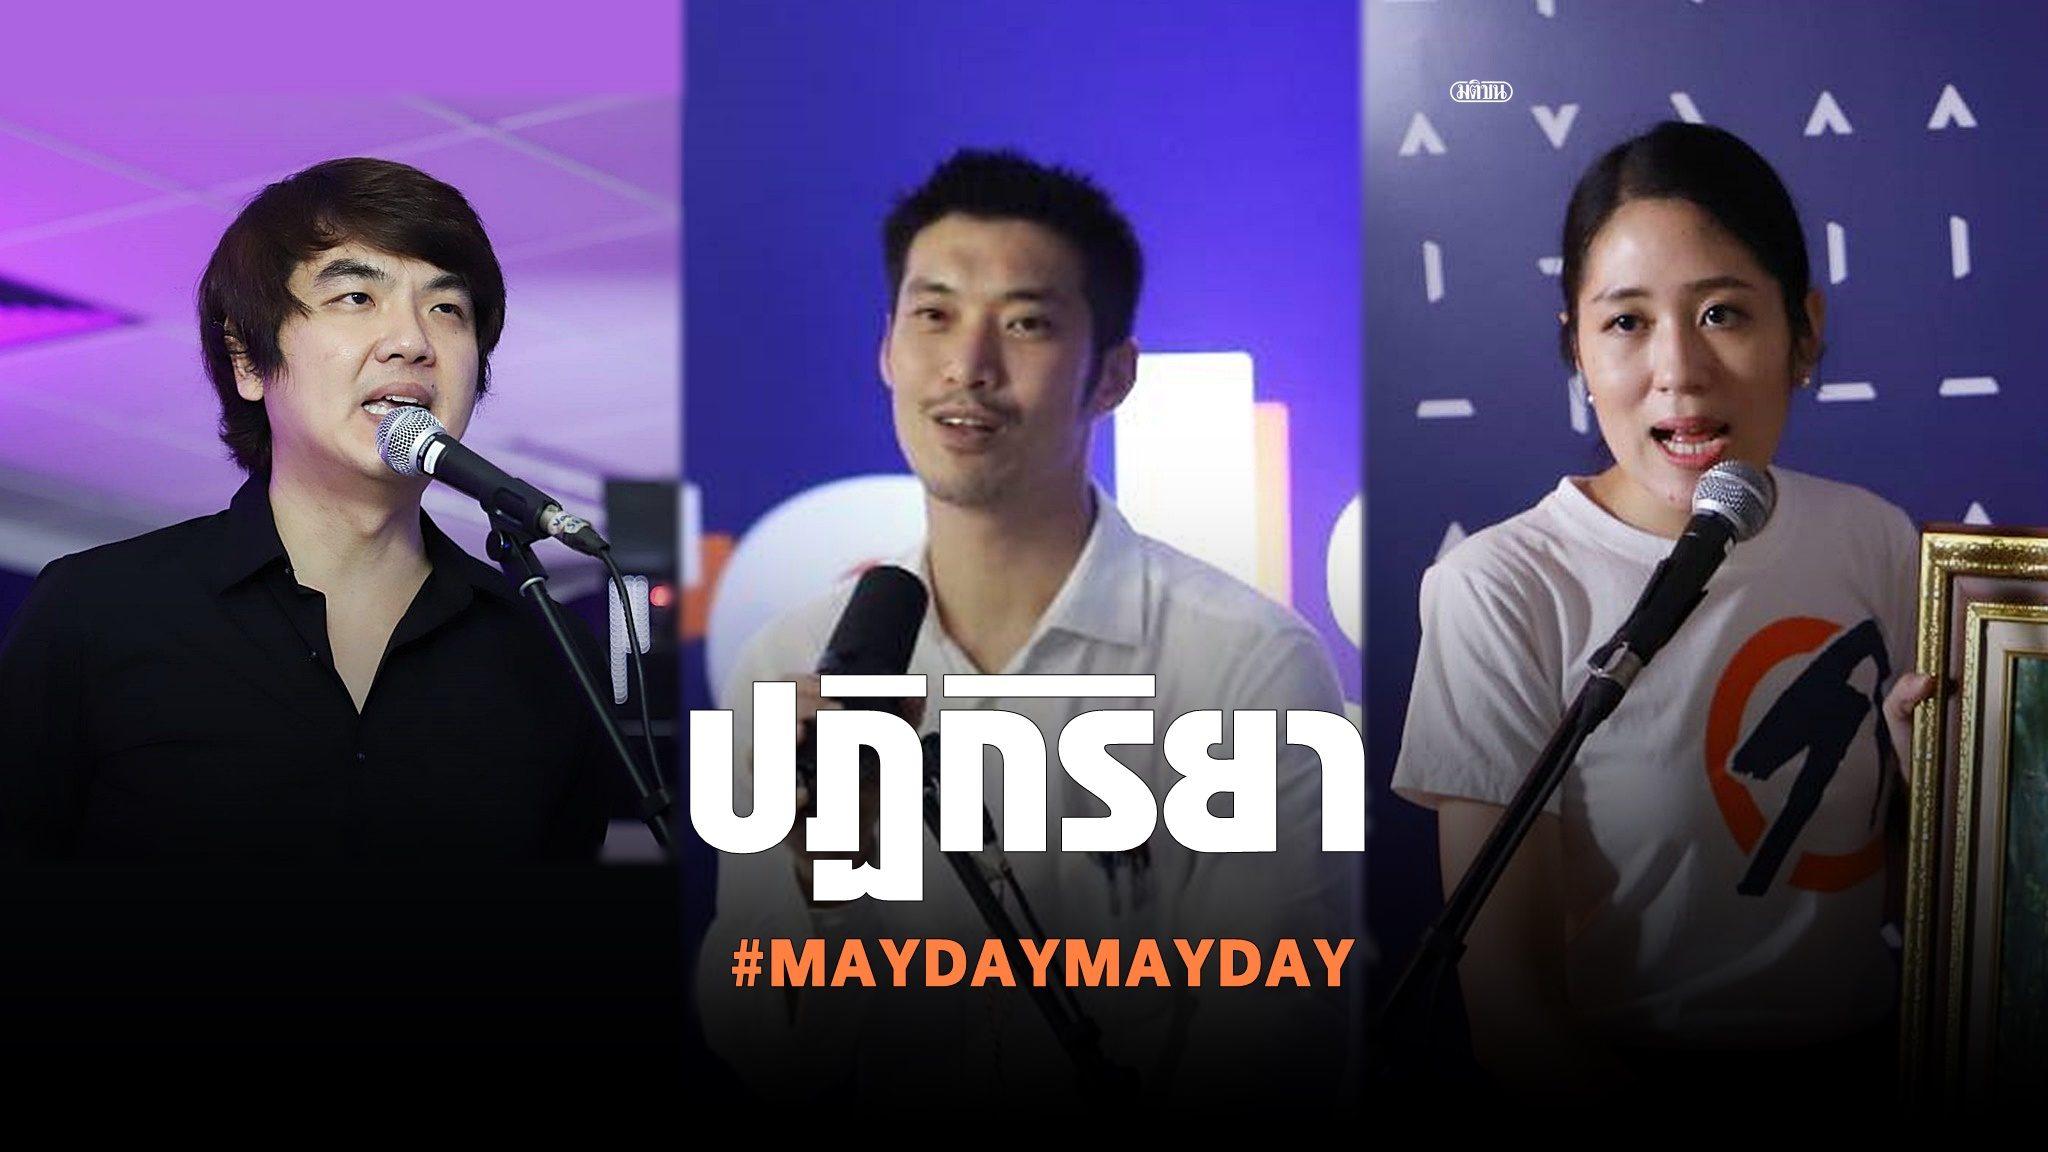 09.00 INDEX ทำไม #MAYDAYMAYDAY จึงก่อความหงุดหงิด ความไม่พอใจ